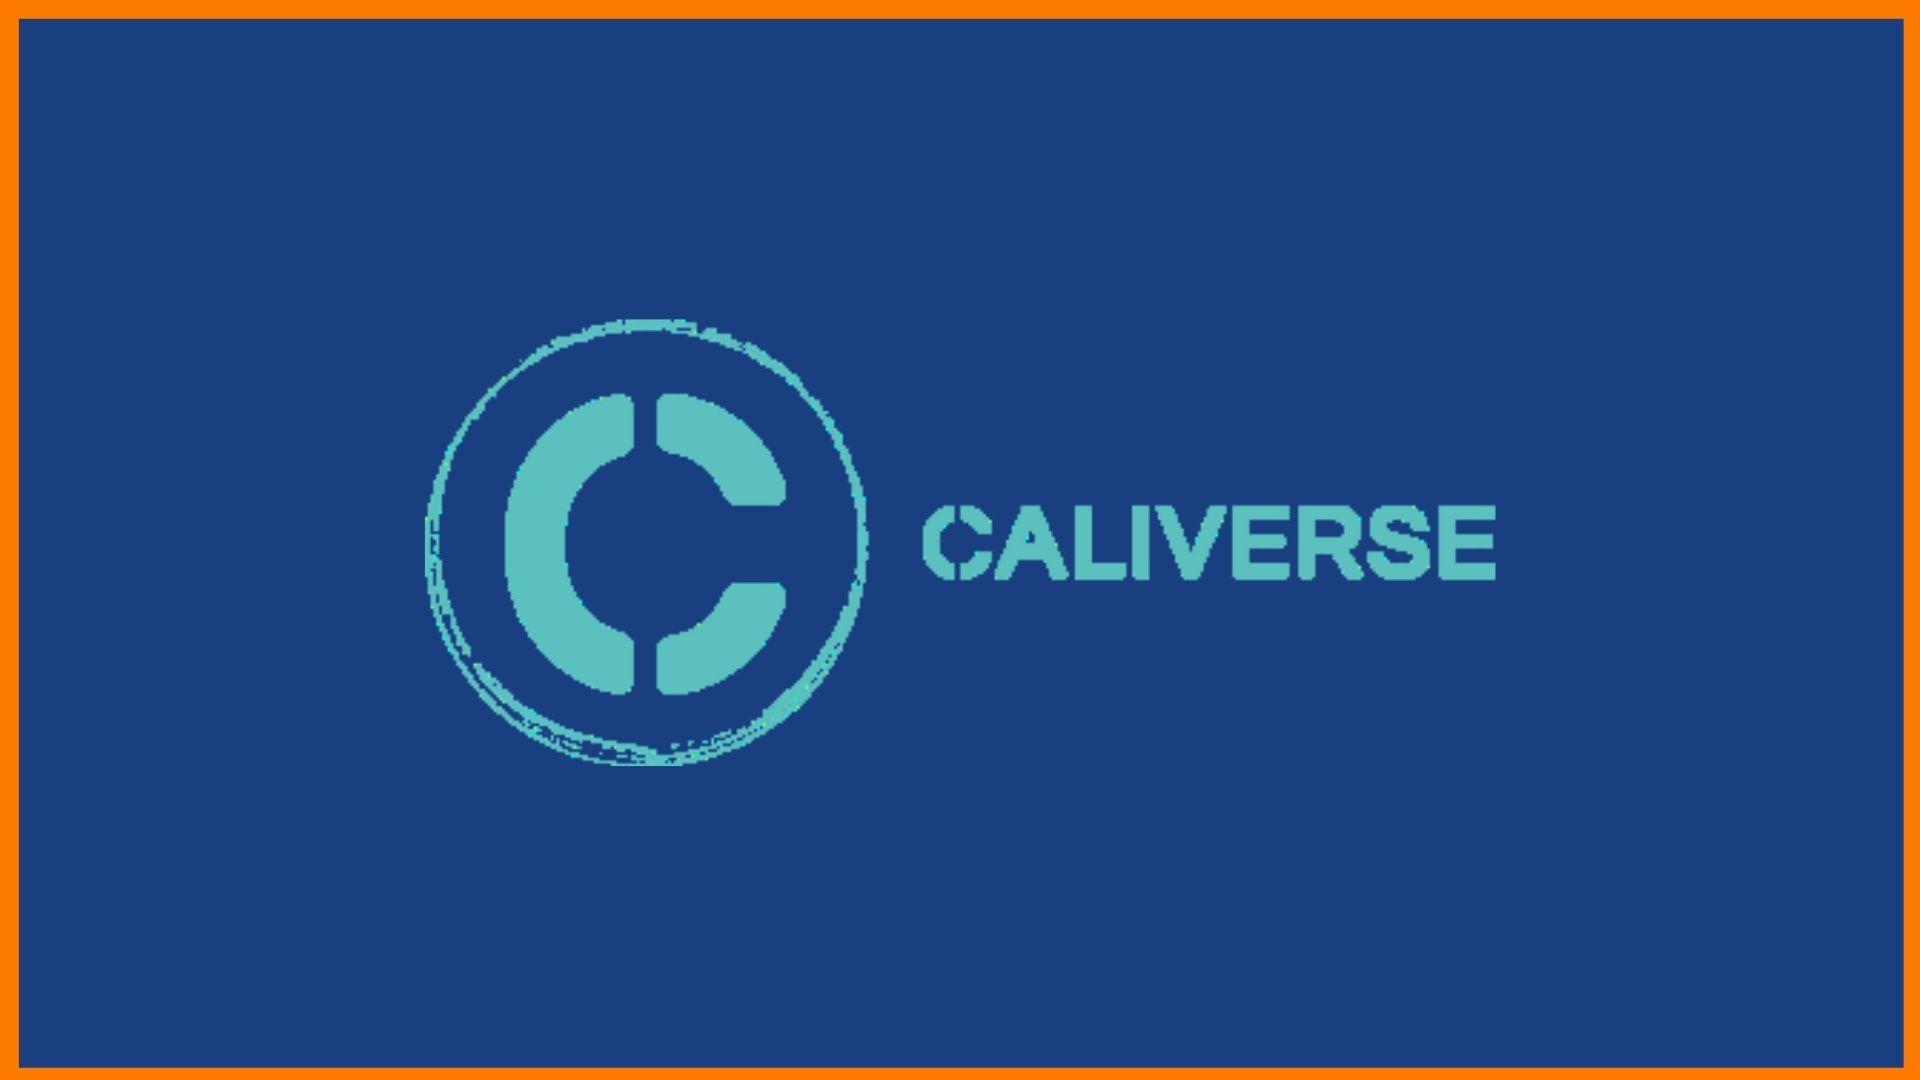 Caliverse Logo